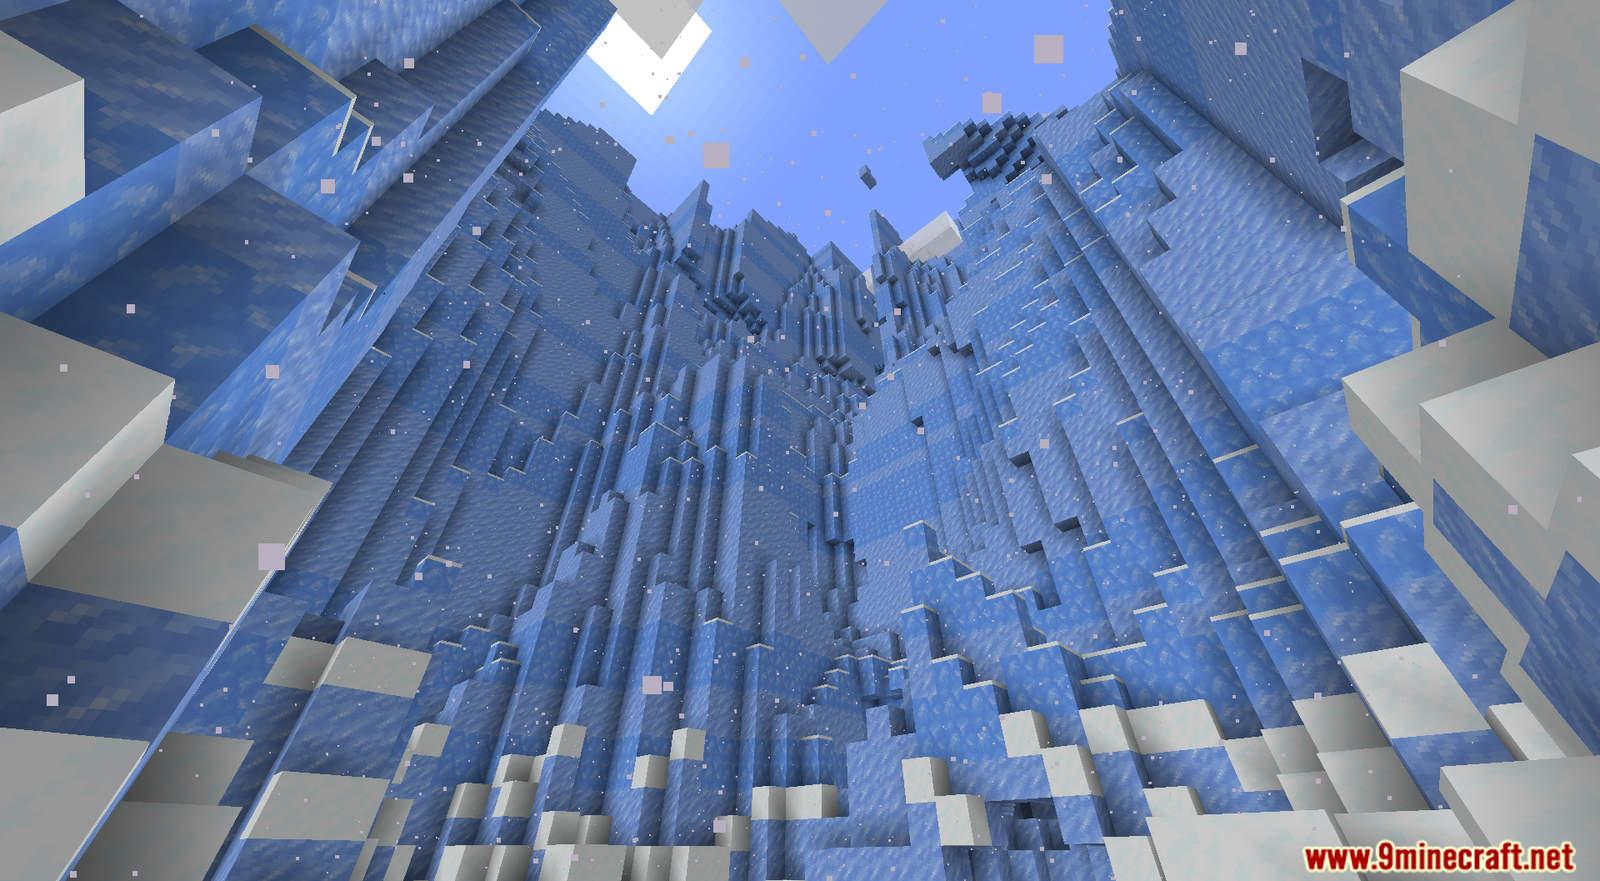 William Wythers' Overhauled Overworld Mod for Minecraft (17)